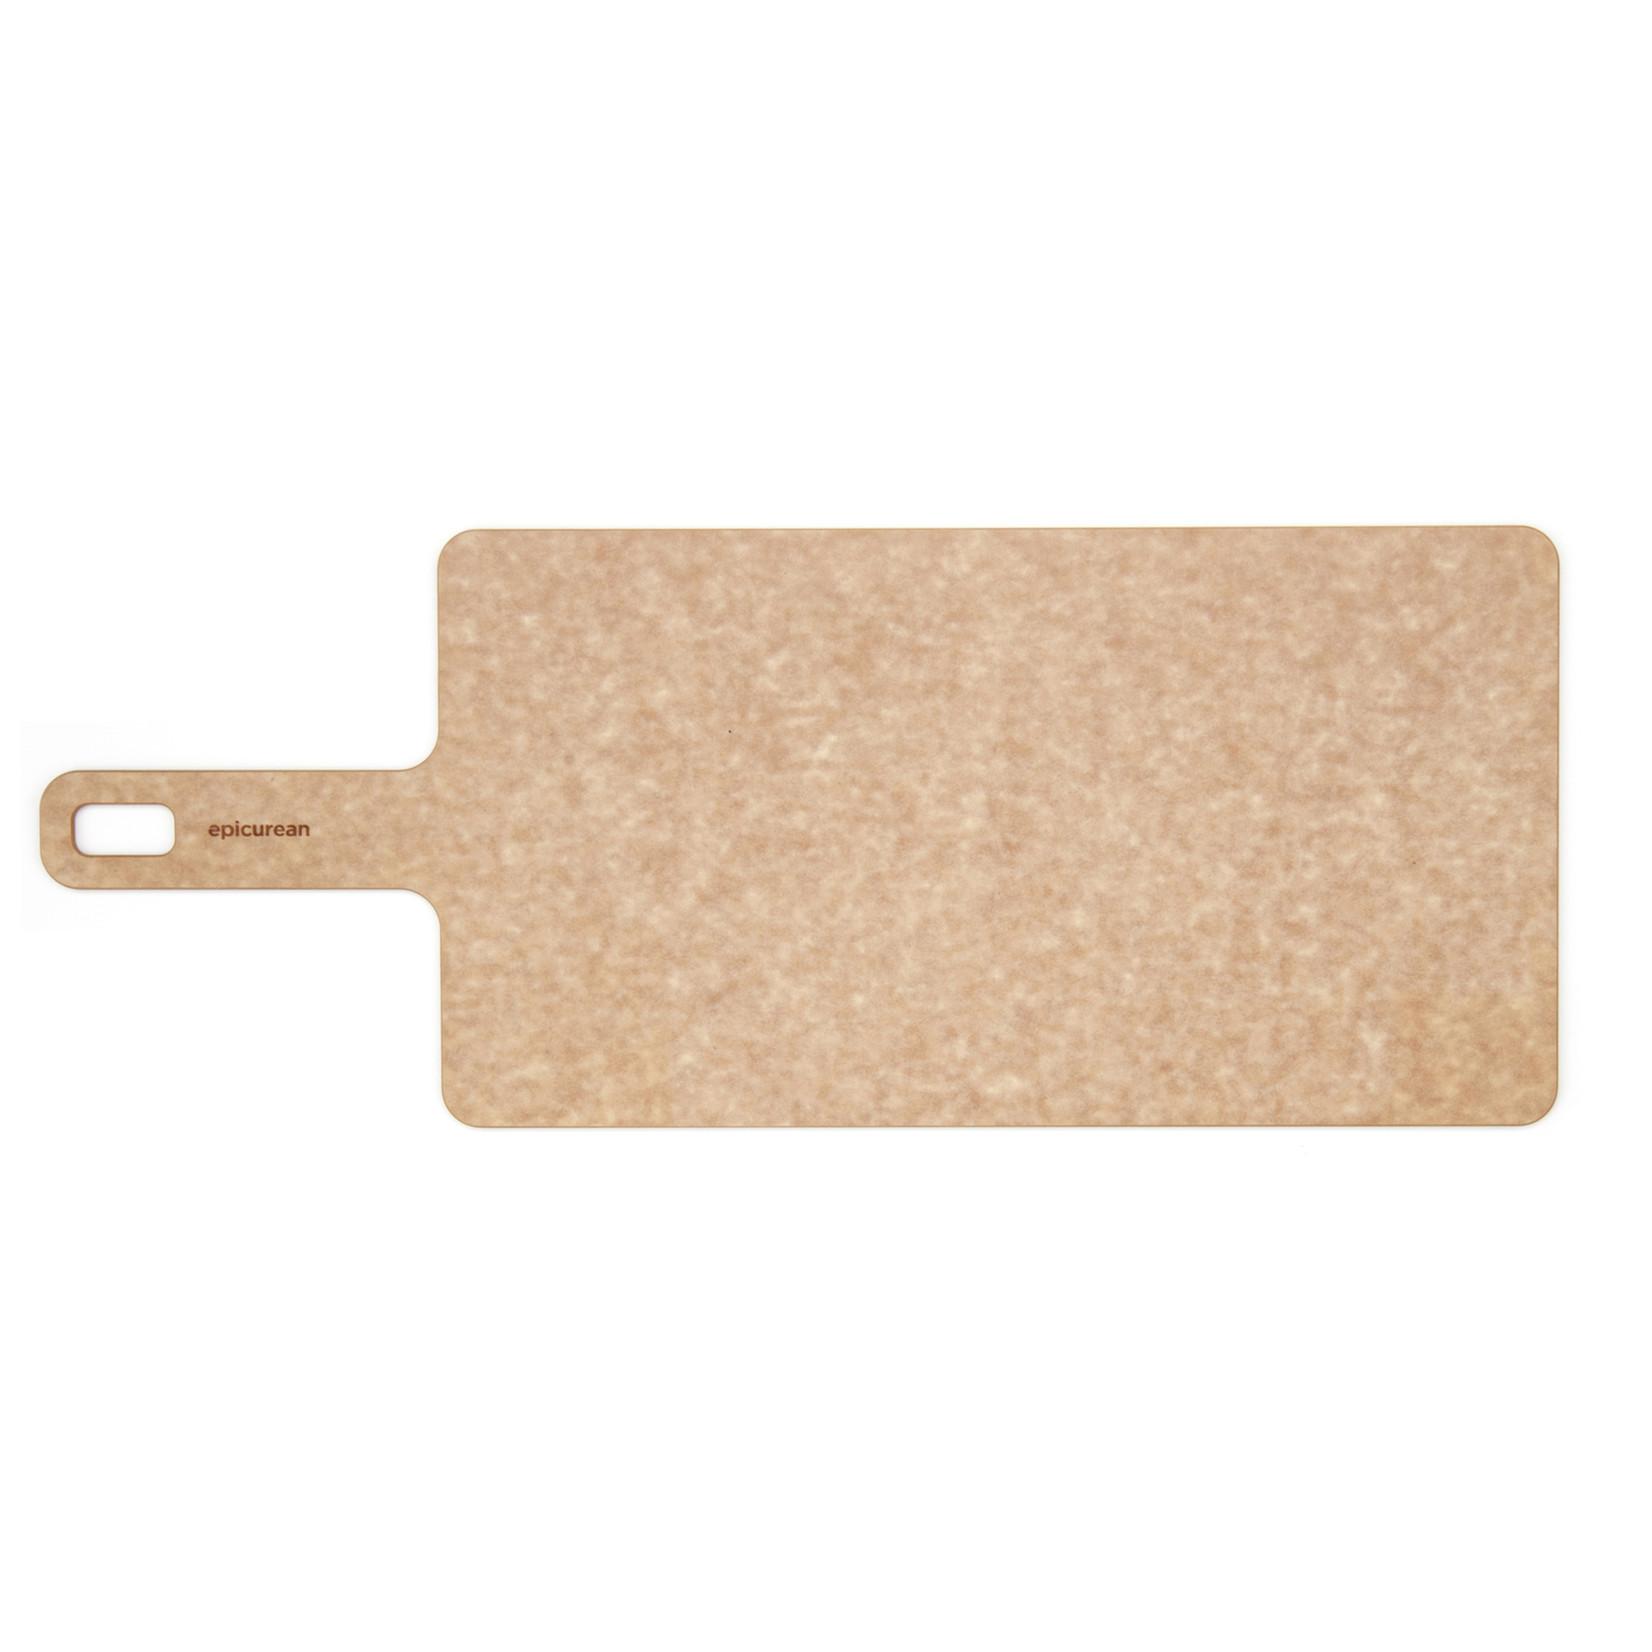 Epicurean Handy Series Cutting Board